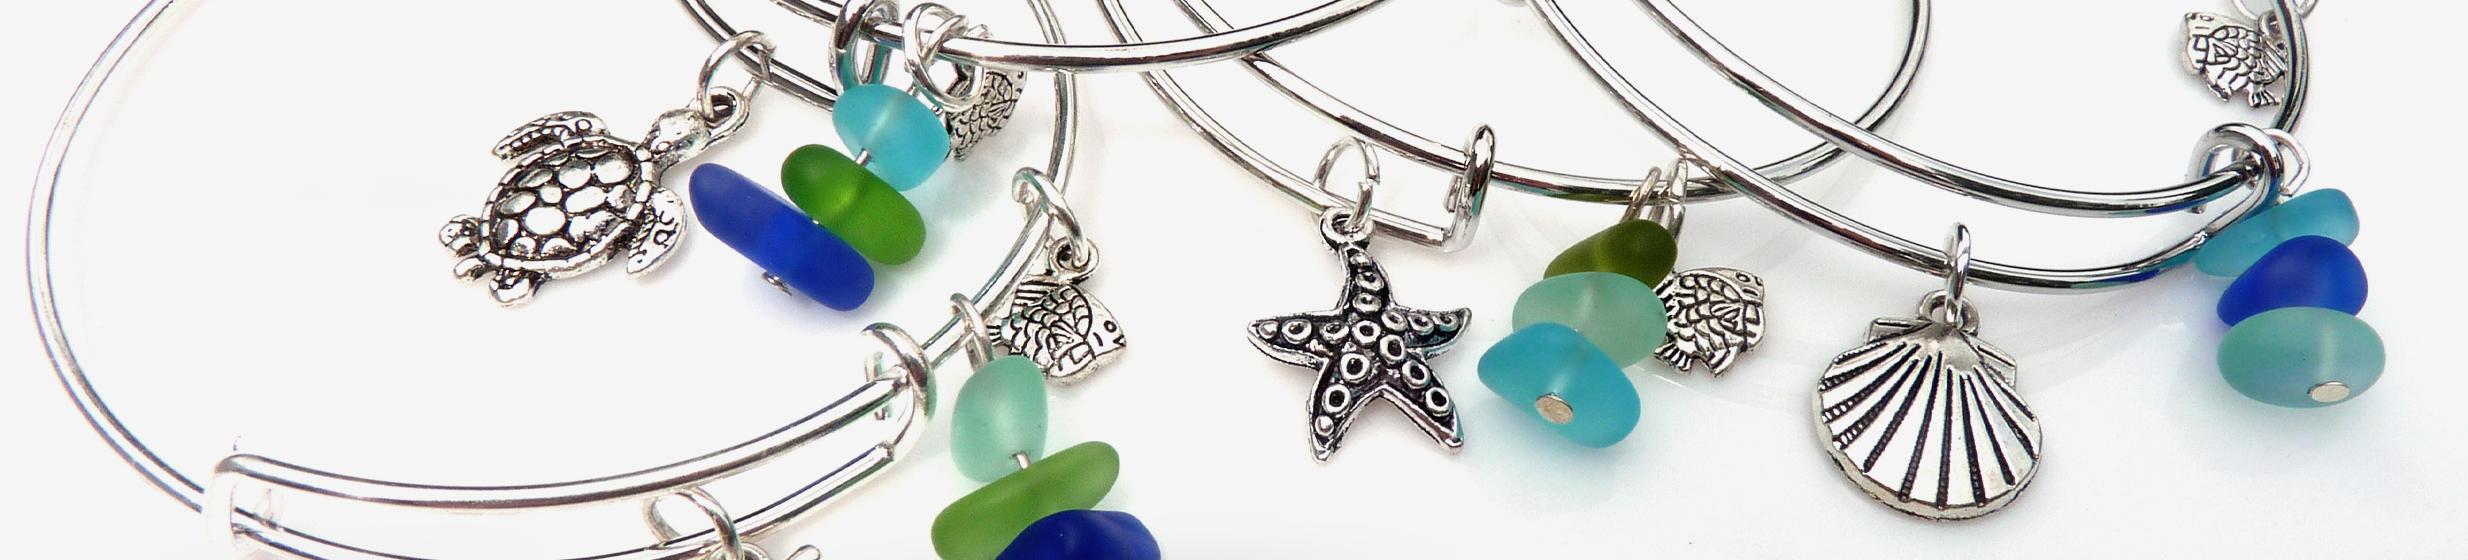 Coastlines Multicolored Glass Fish Bones Necklace Snazzy /& co